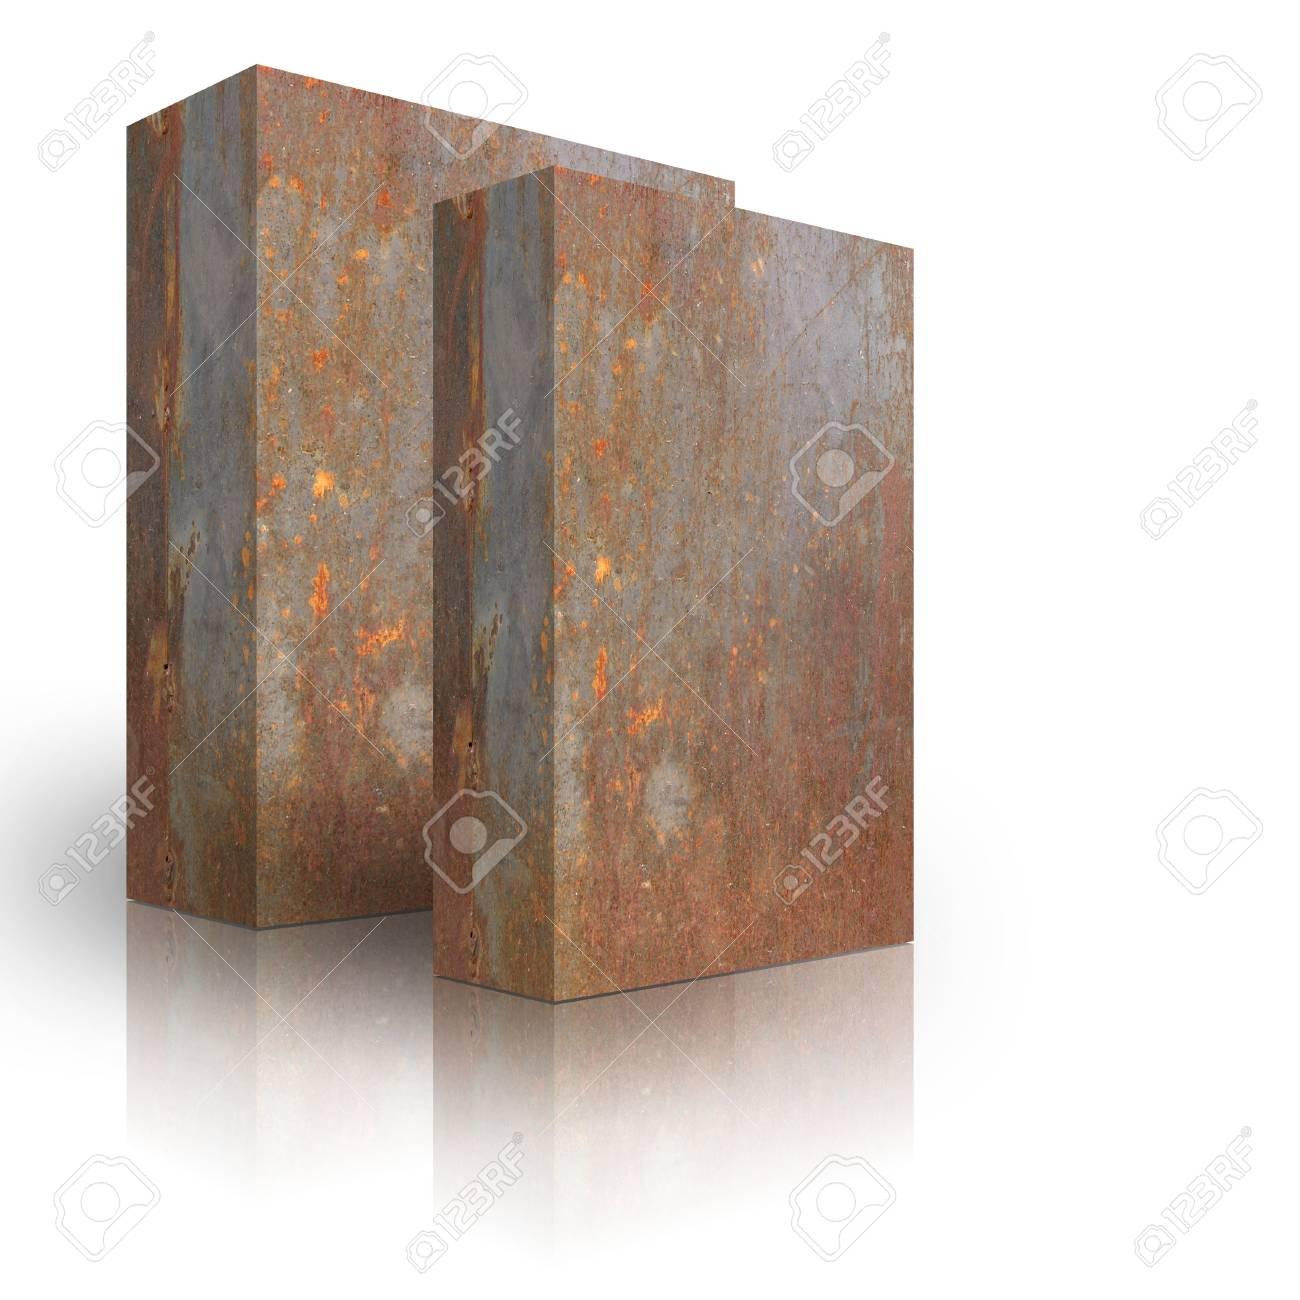 Metal box on a white background Stock Photo - 3628004